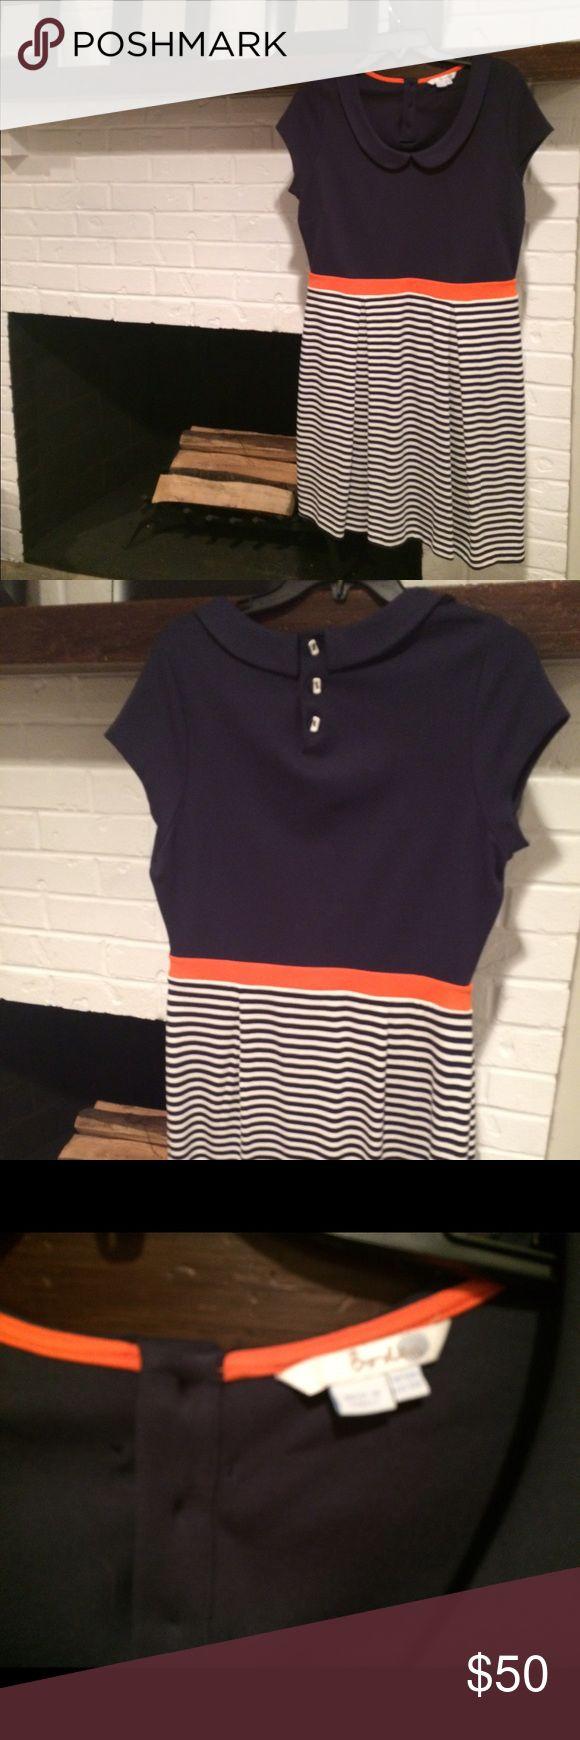 Boden Dress Never worn, excellent condition. Boden Dresses Midi